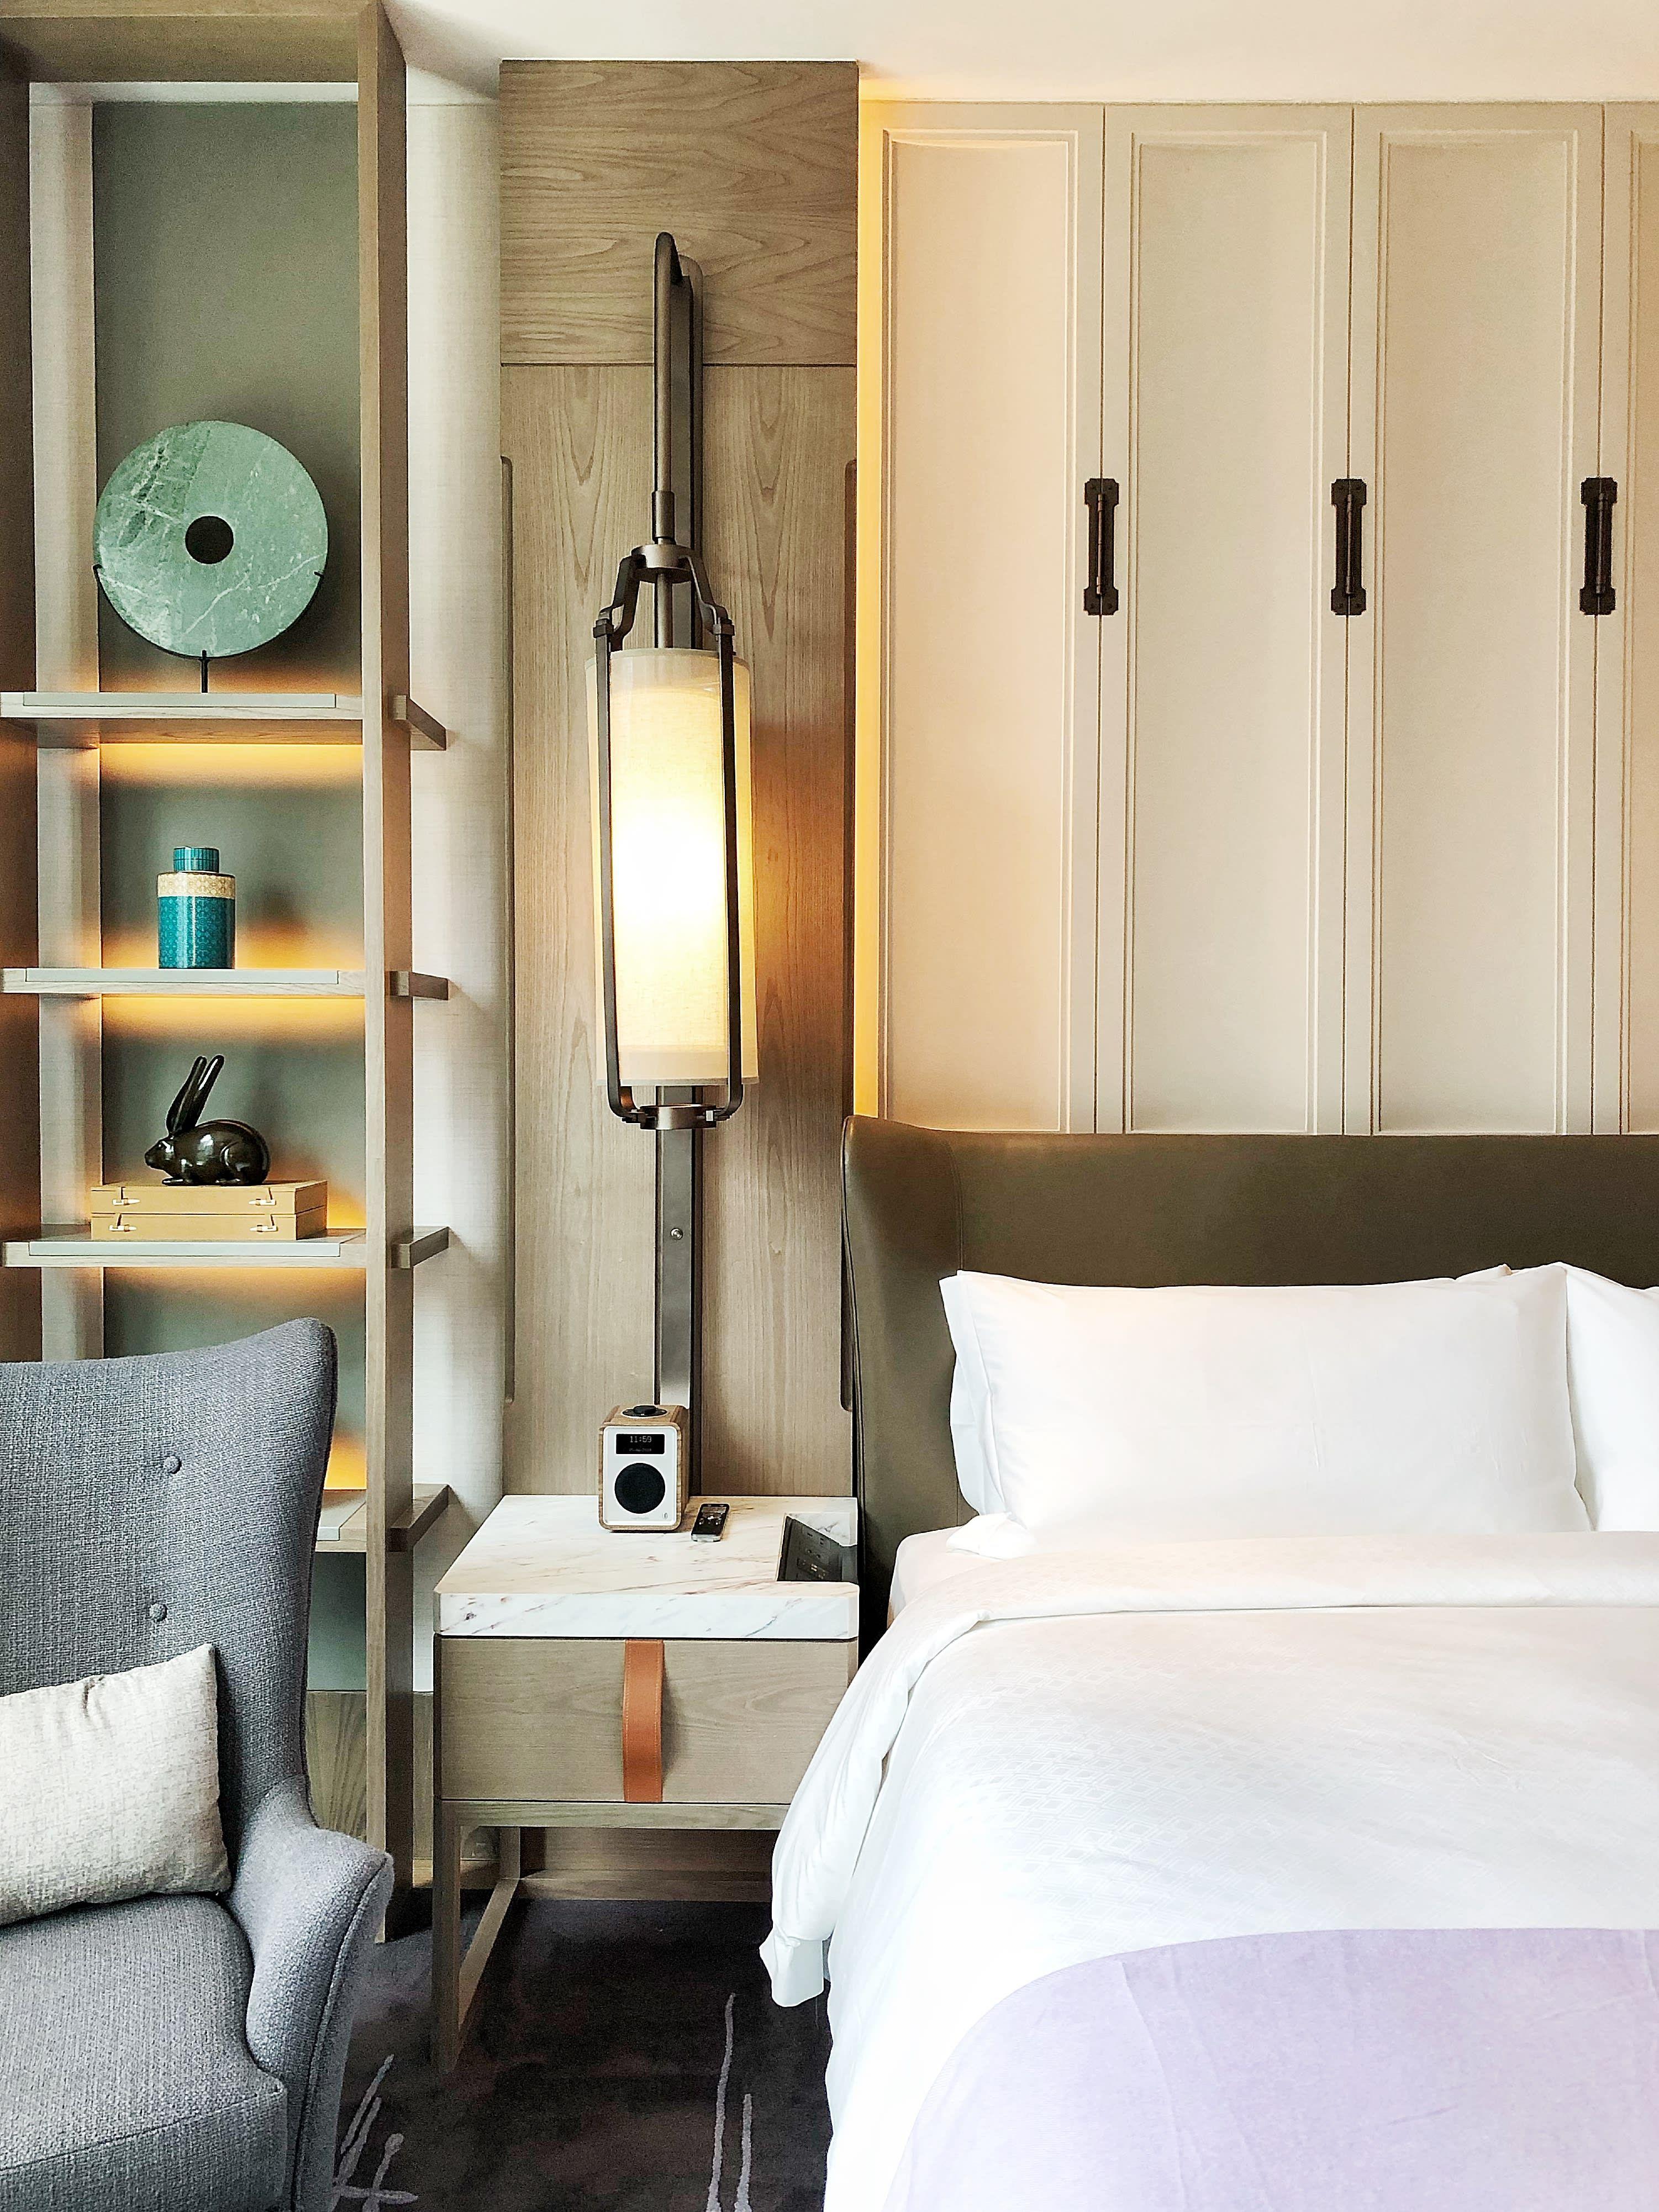 5 Five Star Hotel Bedroom Decorating Tricks To Replicate At Home Bedroom Hotel Bedroom Decorating Tips Hotel Bedroom Decor